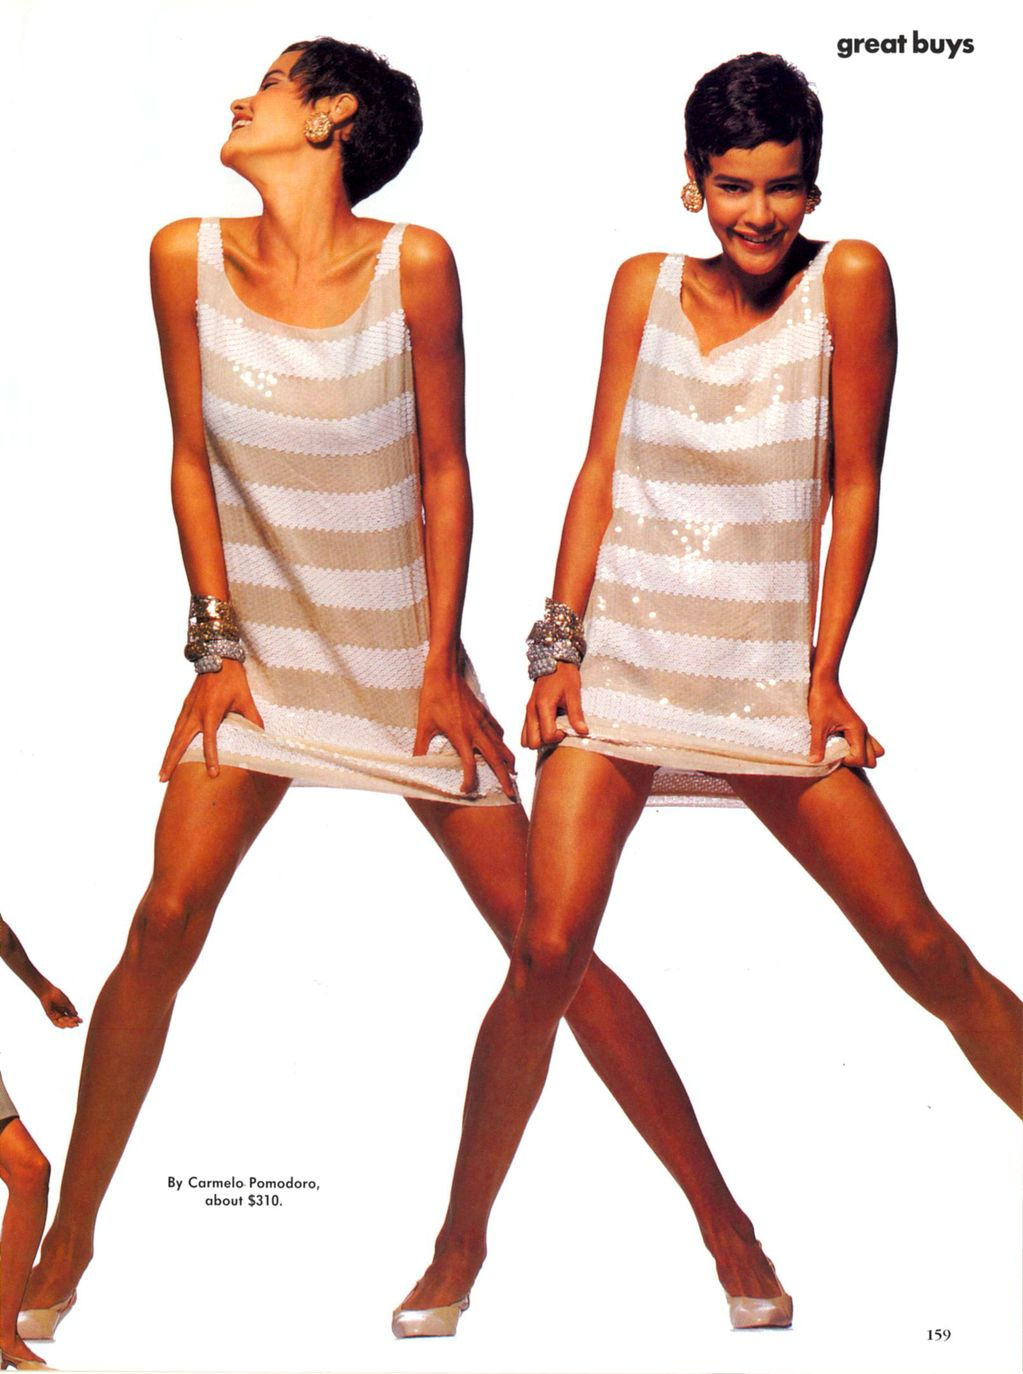 Vogue January 1991 | Great Buys - Dress Rehearsal 08.jpg